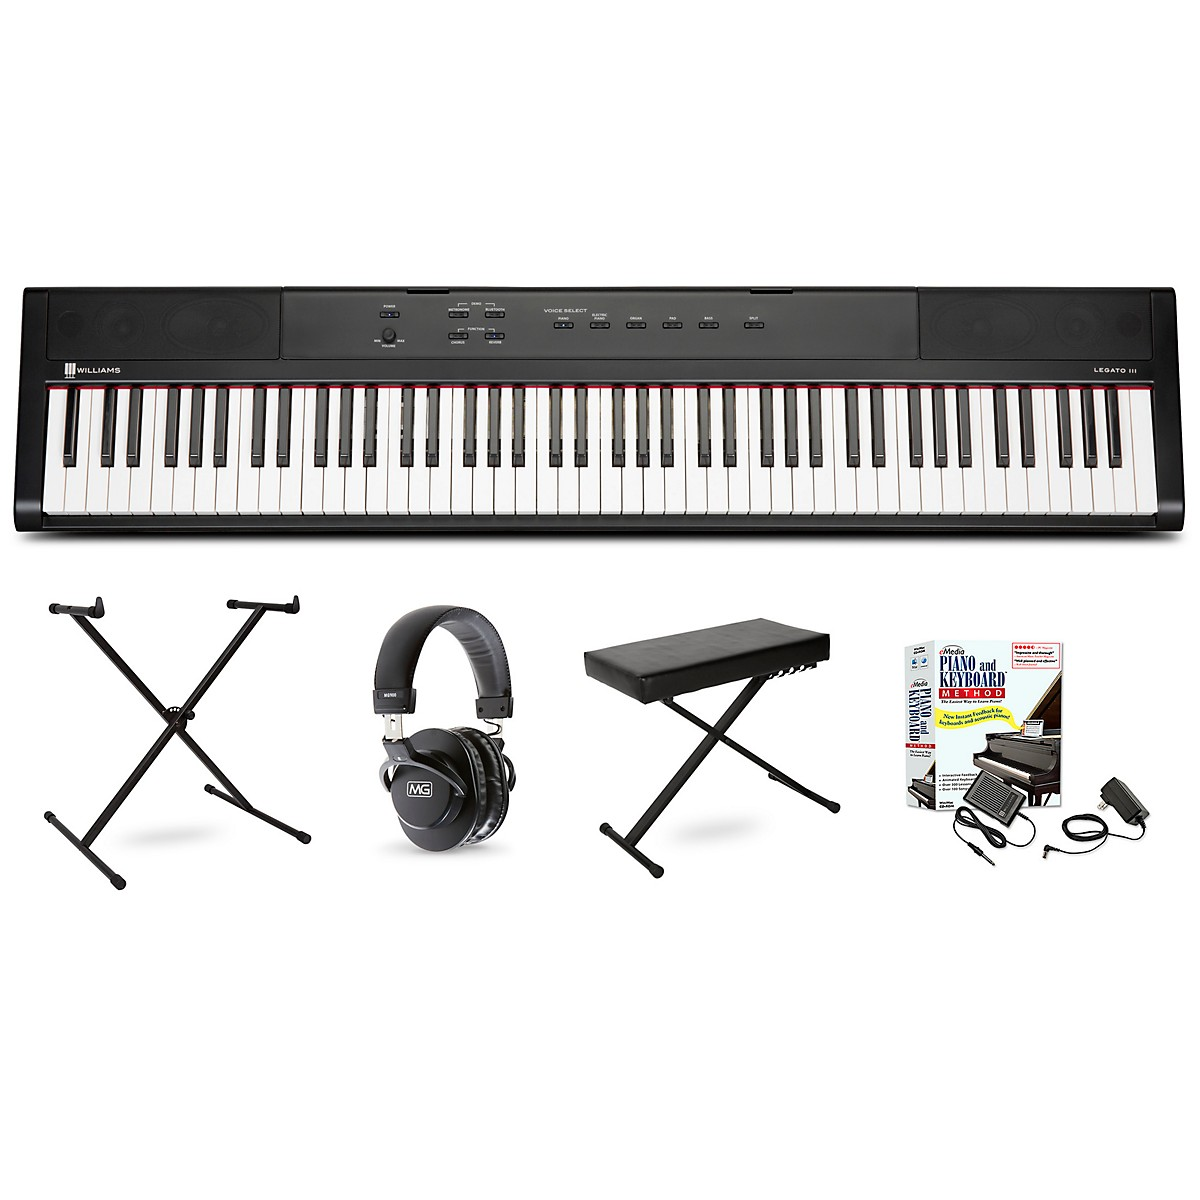 Williams Legato III Keyboard Package